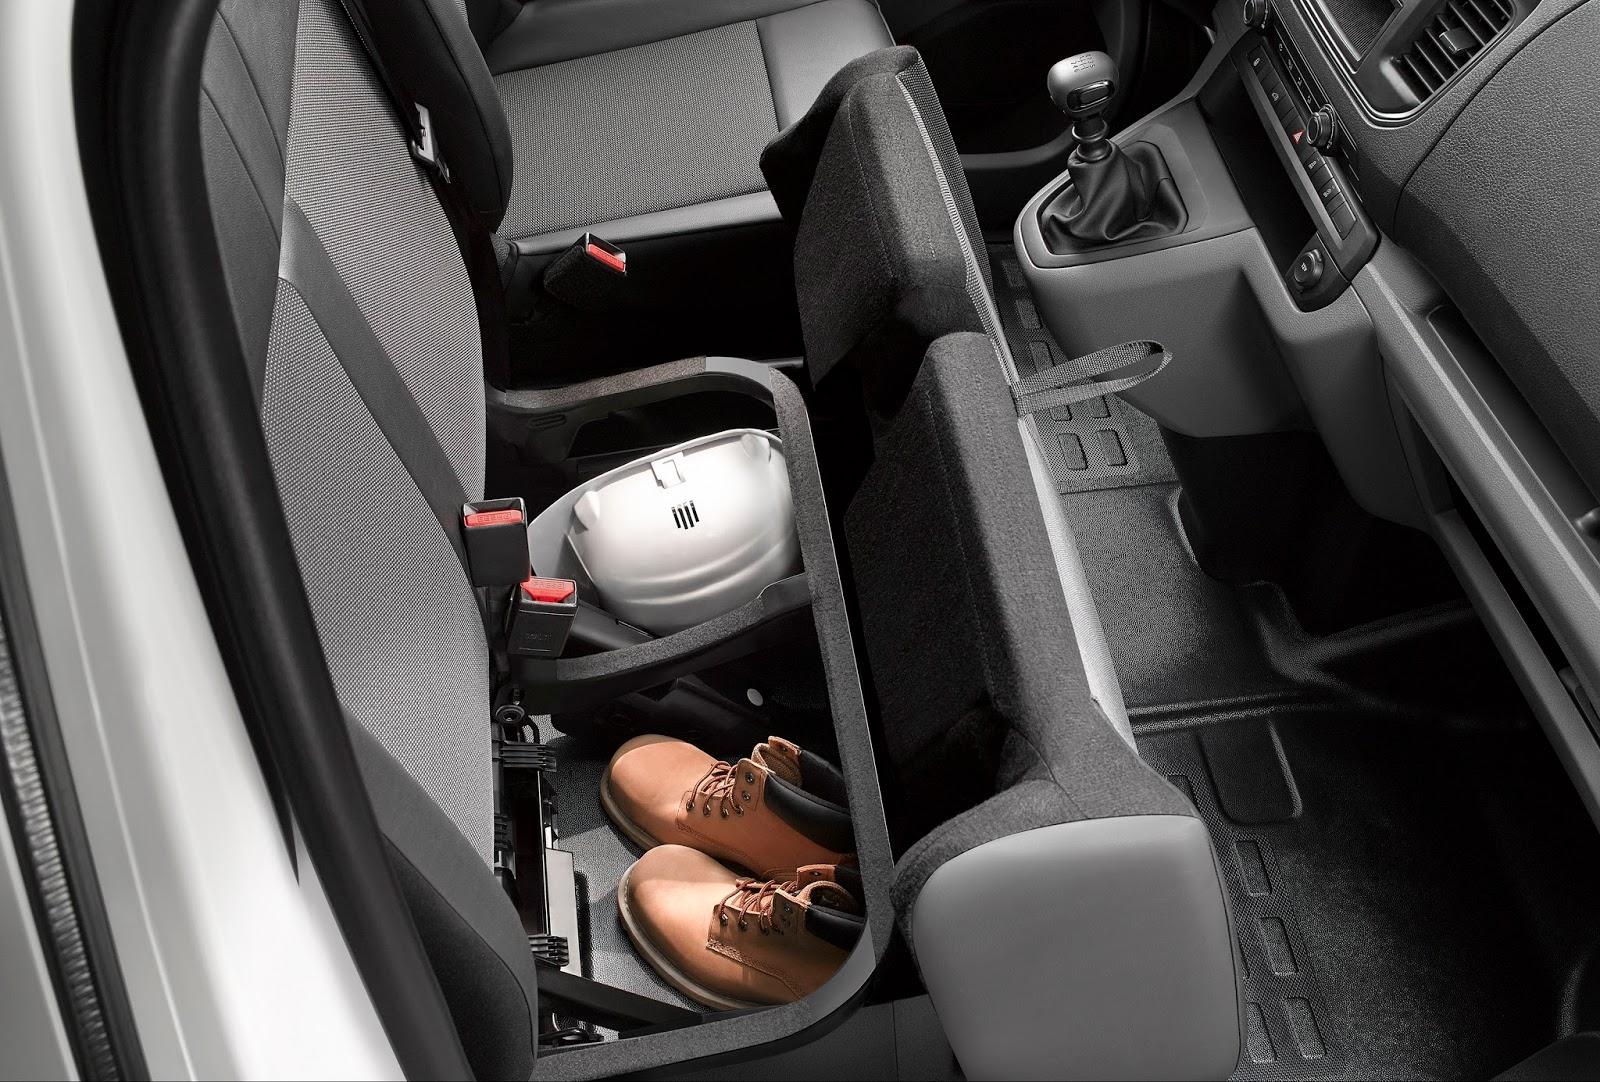 16SS16 Νέο Citroën Jumpy : Ένα καθημερινό εργαλείο citroen, Citroën Jumpy, Επαγγελματικά